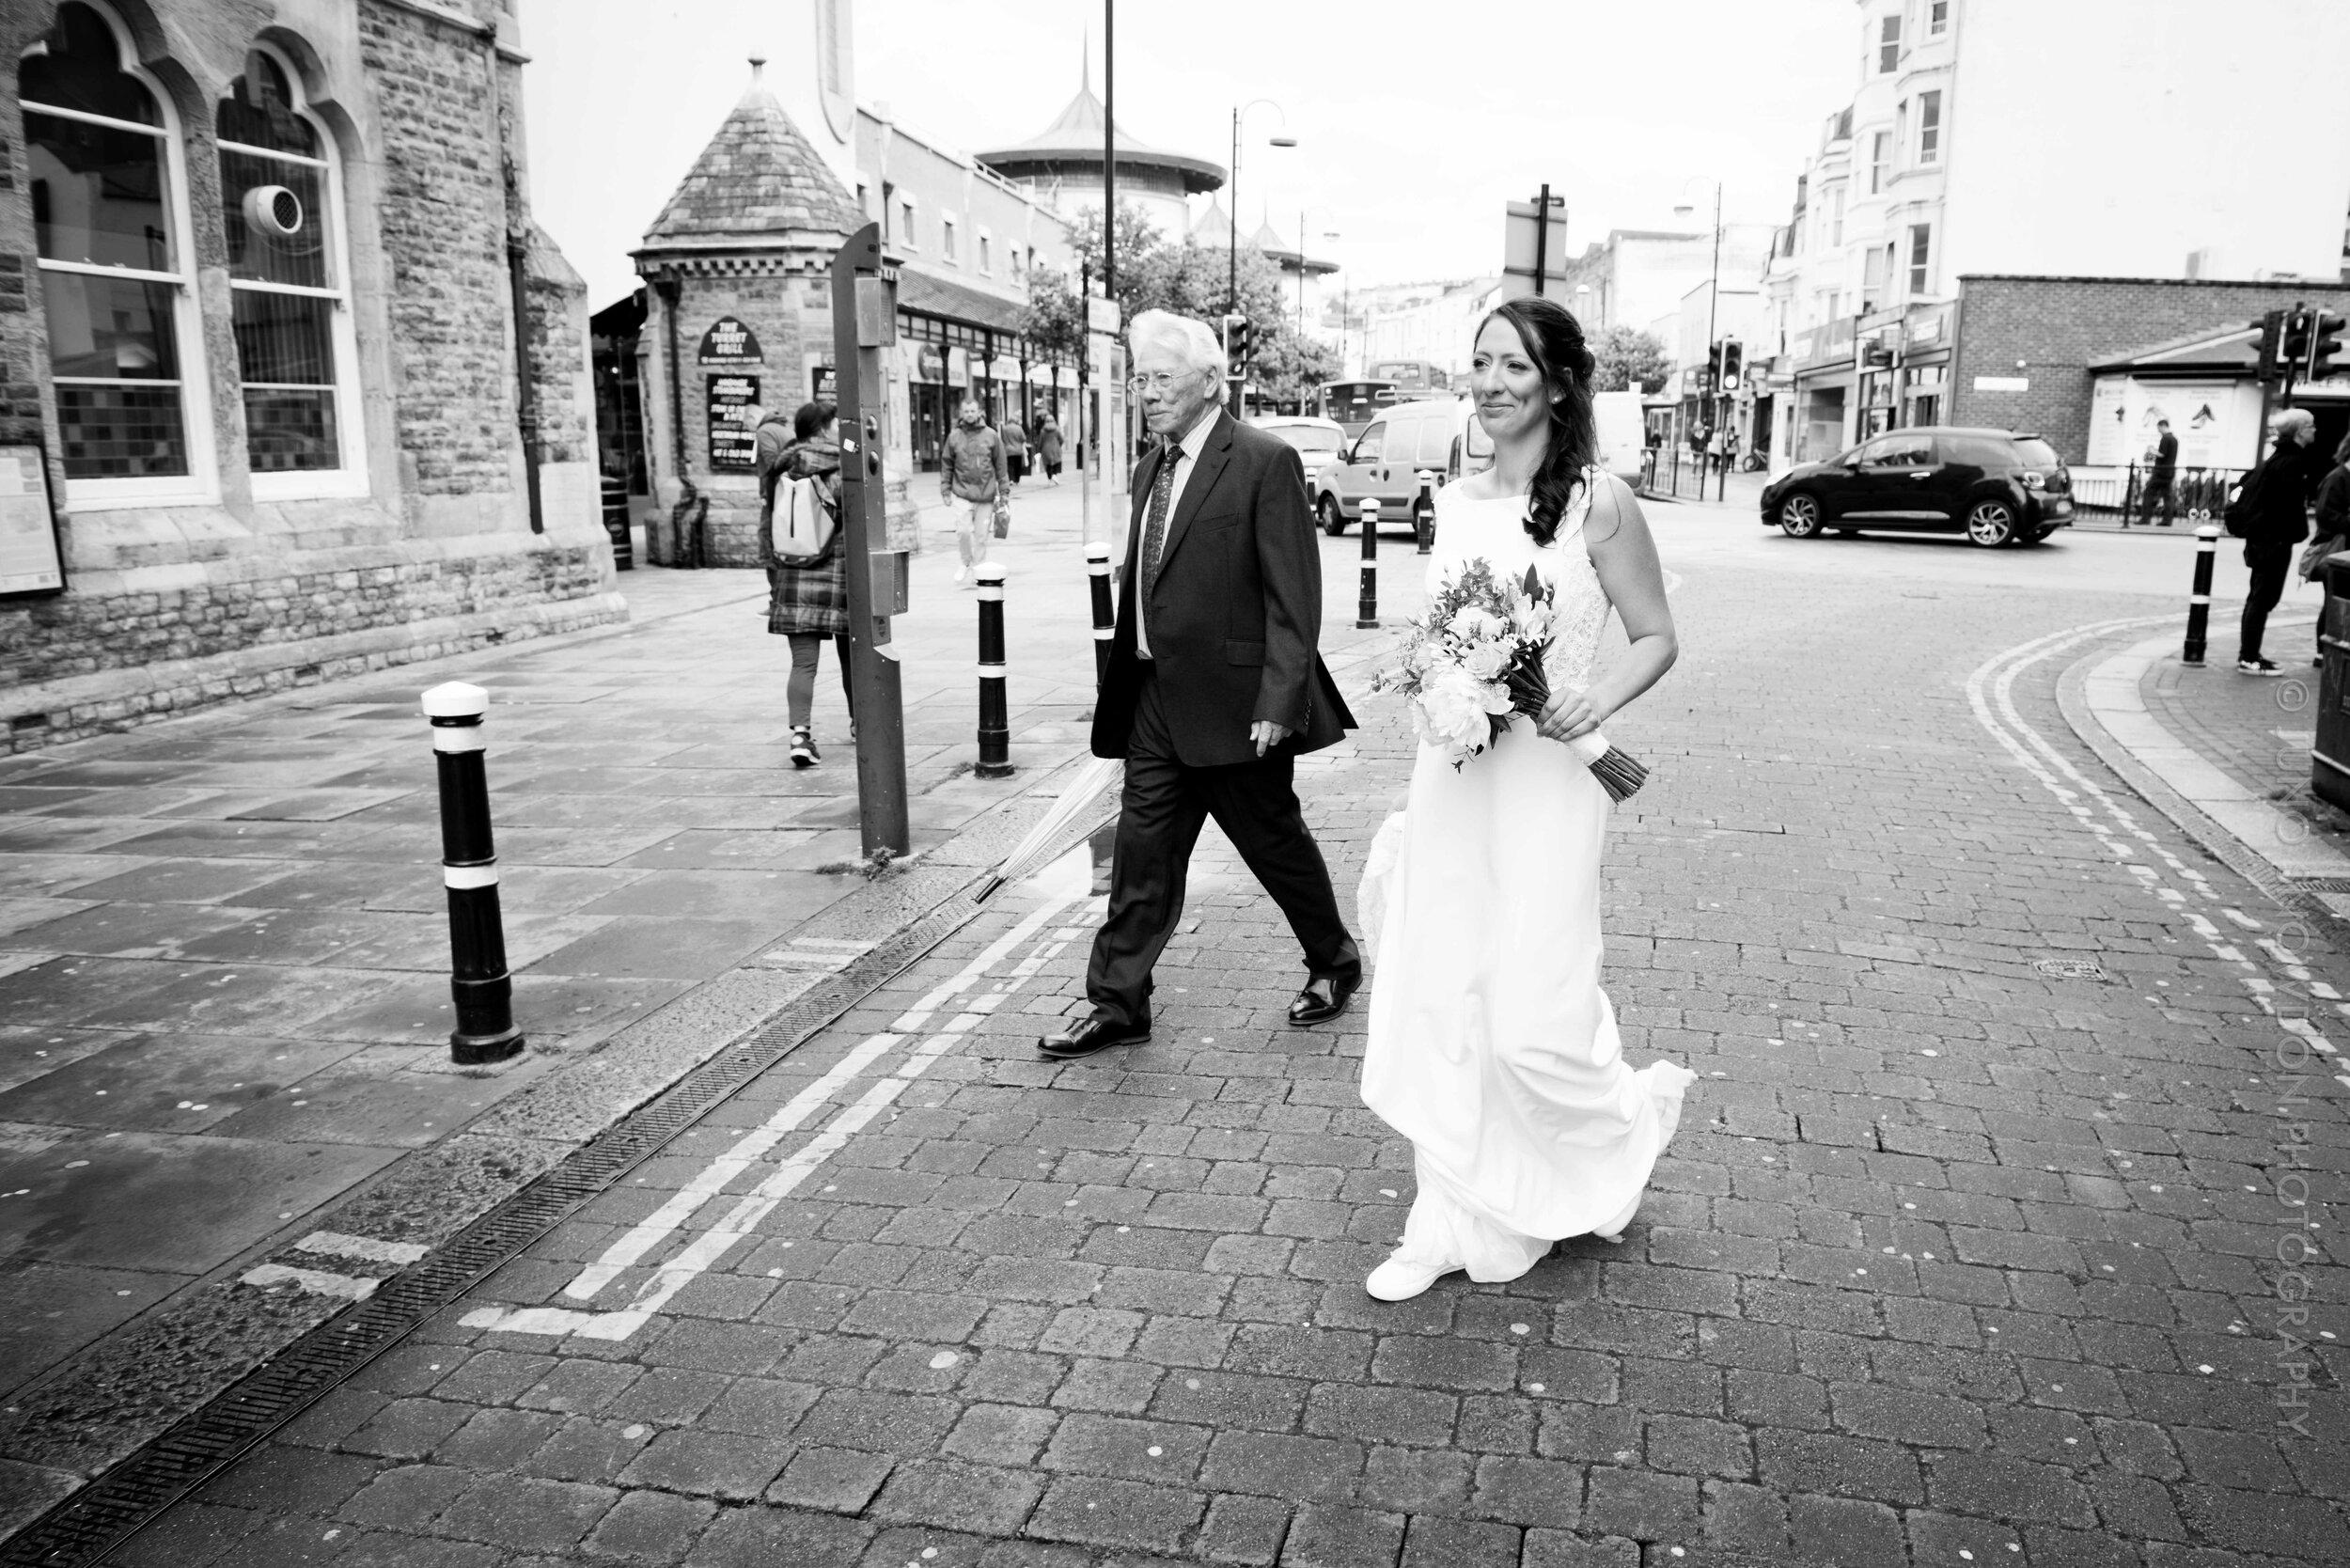 juno-snowdon-photography-wedding-7178.jpg